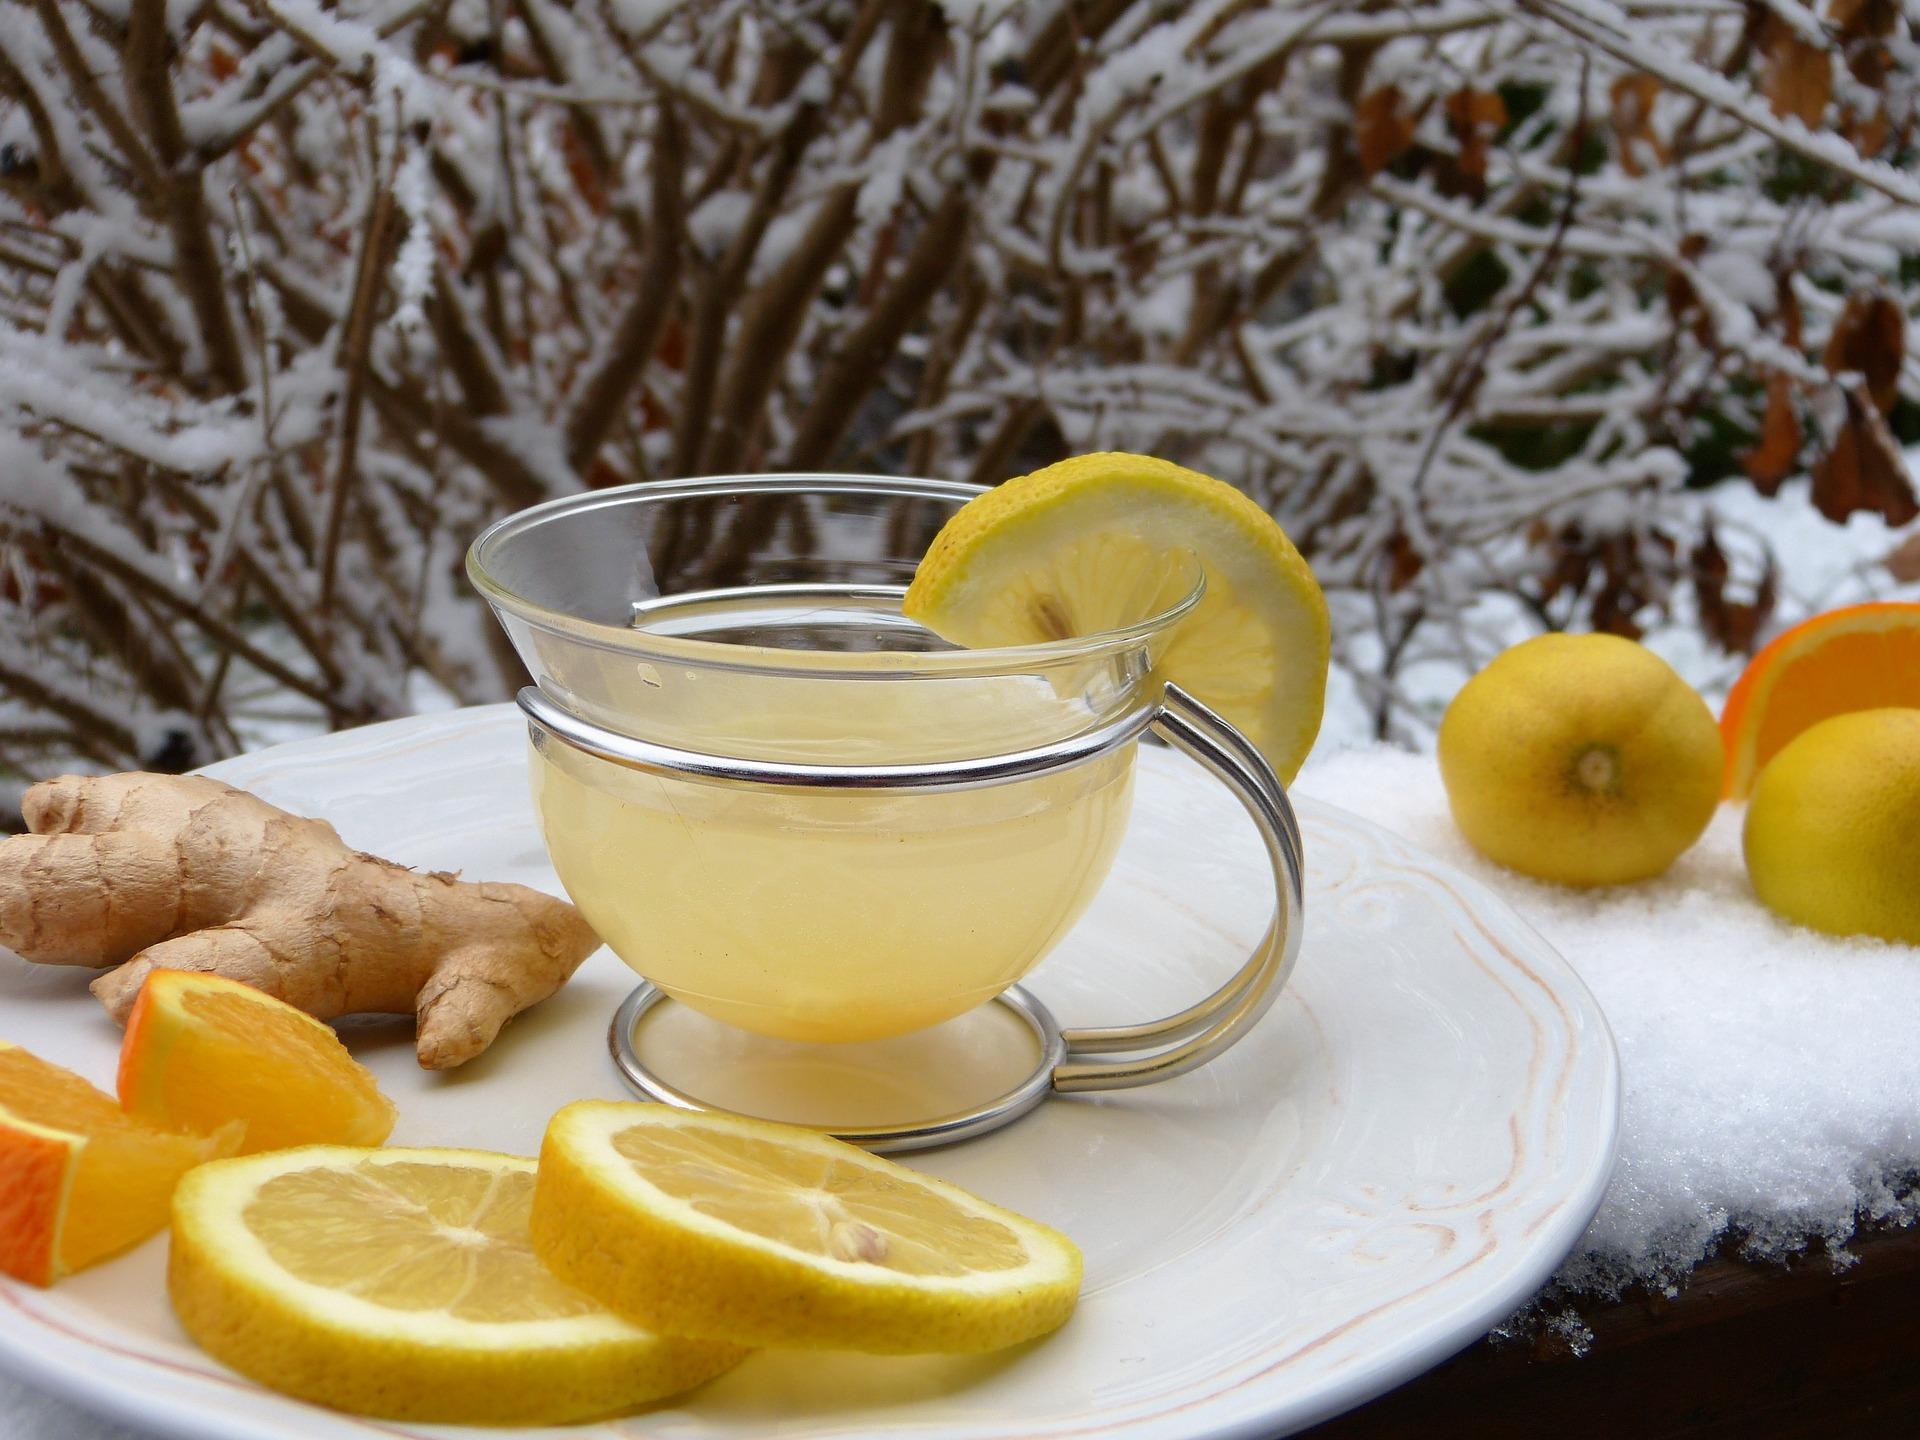 herbal homeopathic natural pediatric medicine tea watters waters amanda nd naturopathic doctor physician